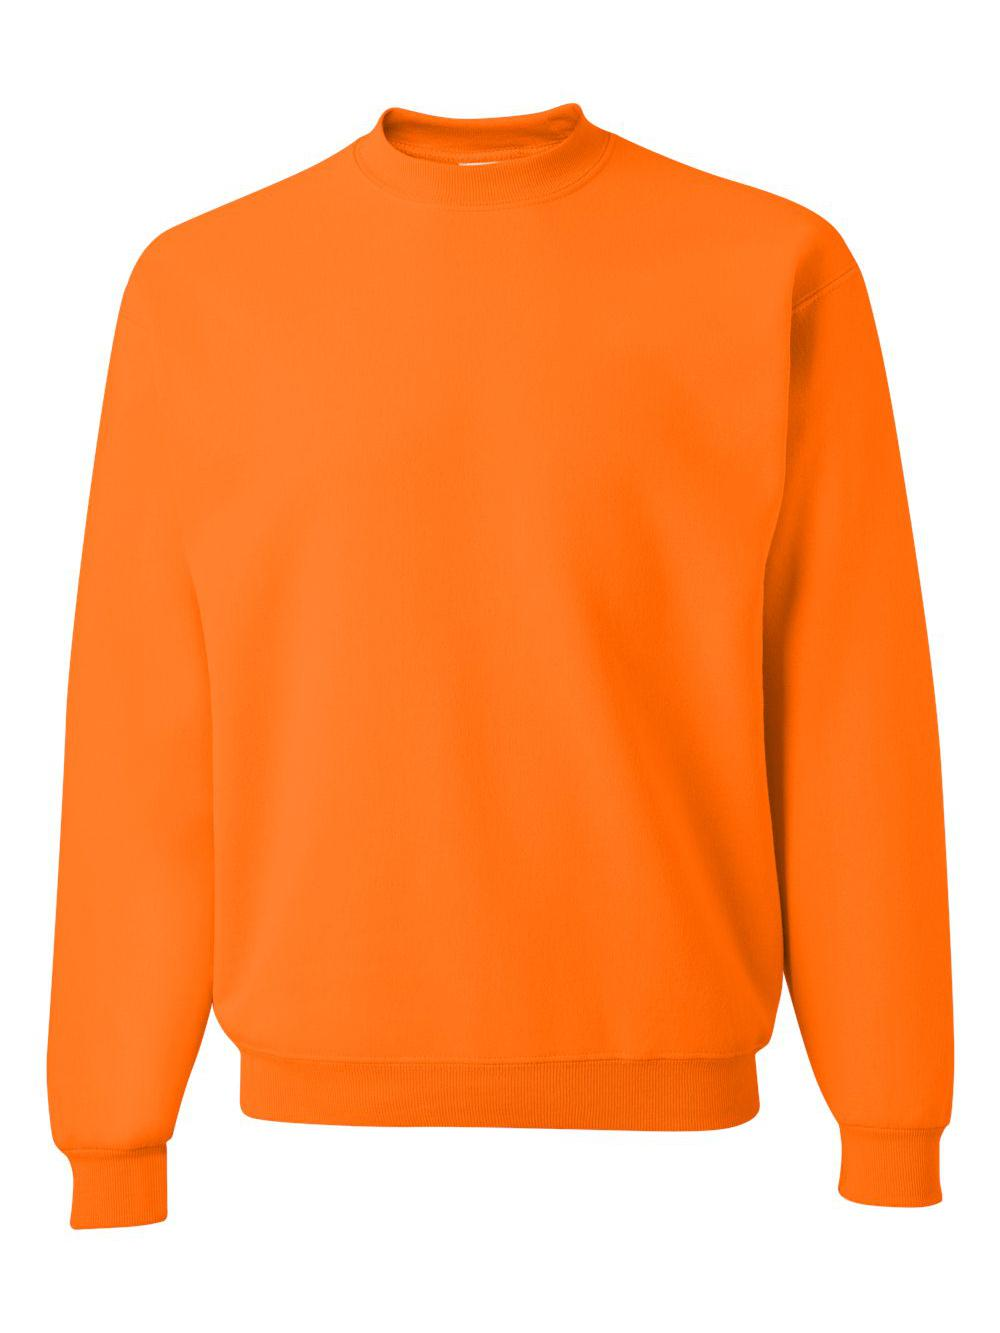 Jerzees-NuBlend-Crewneck-Sweatshirt-562MR thumbnail 78